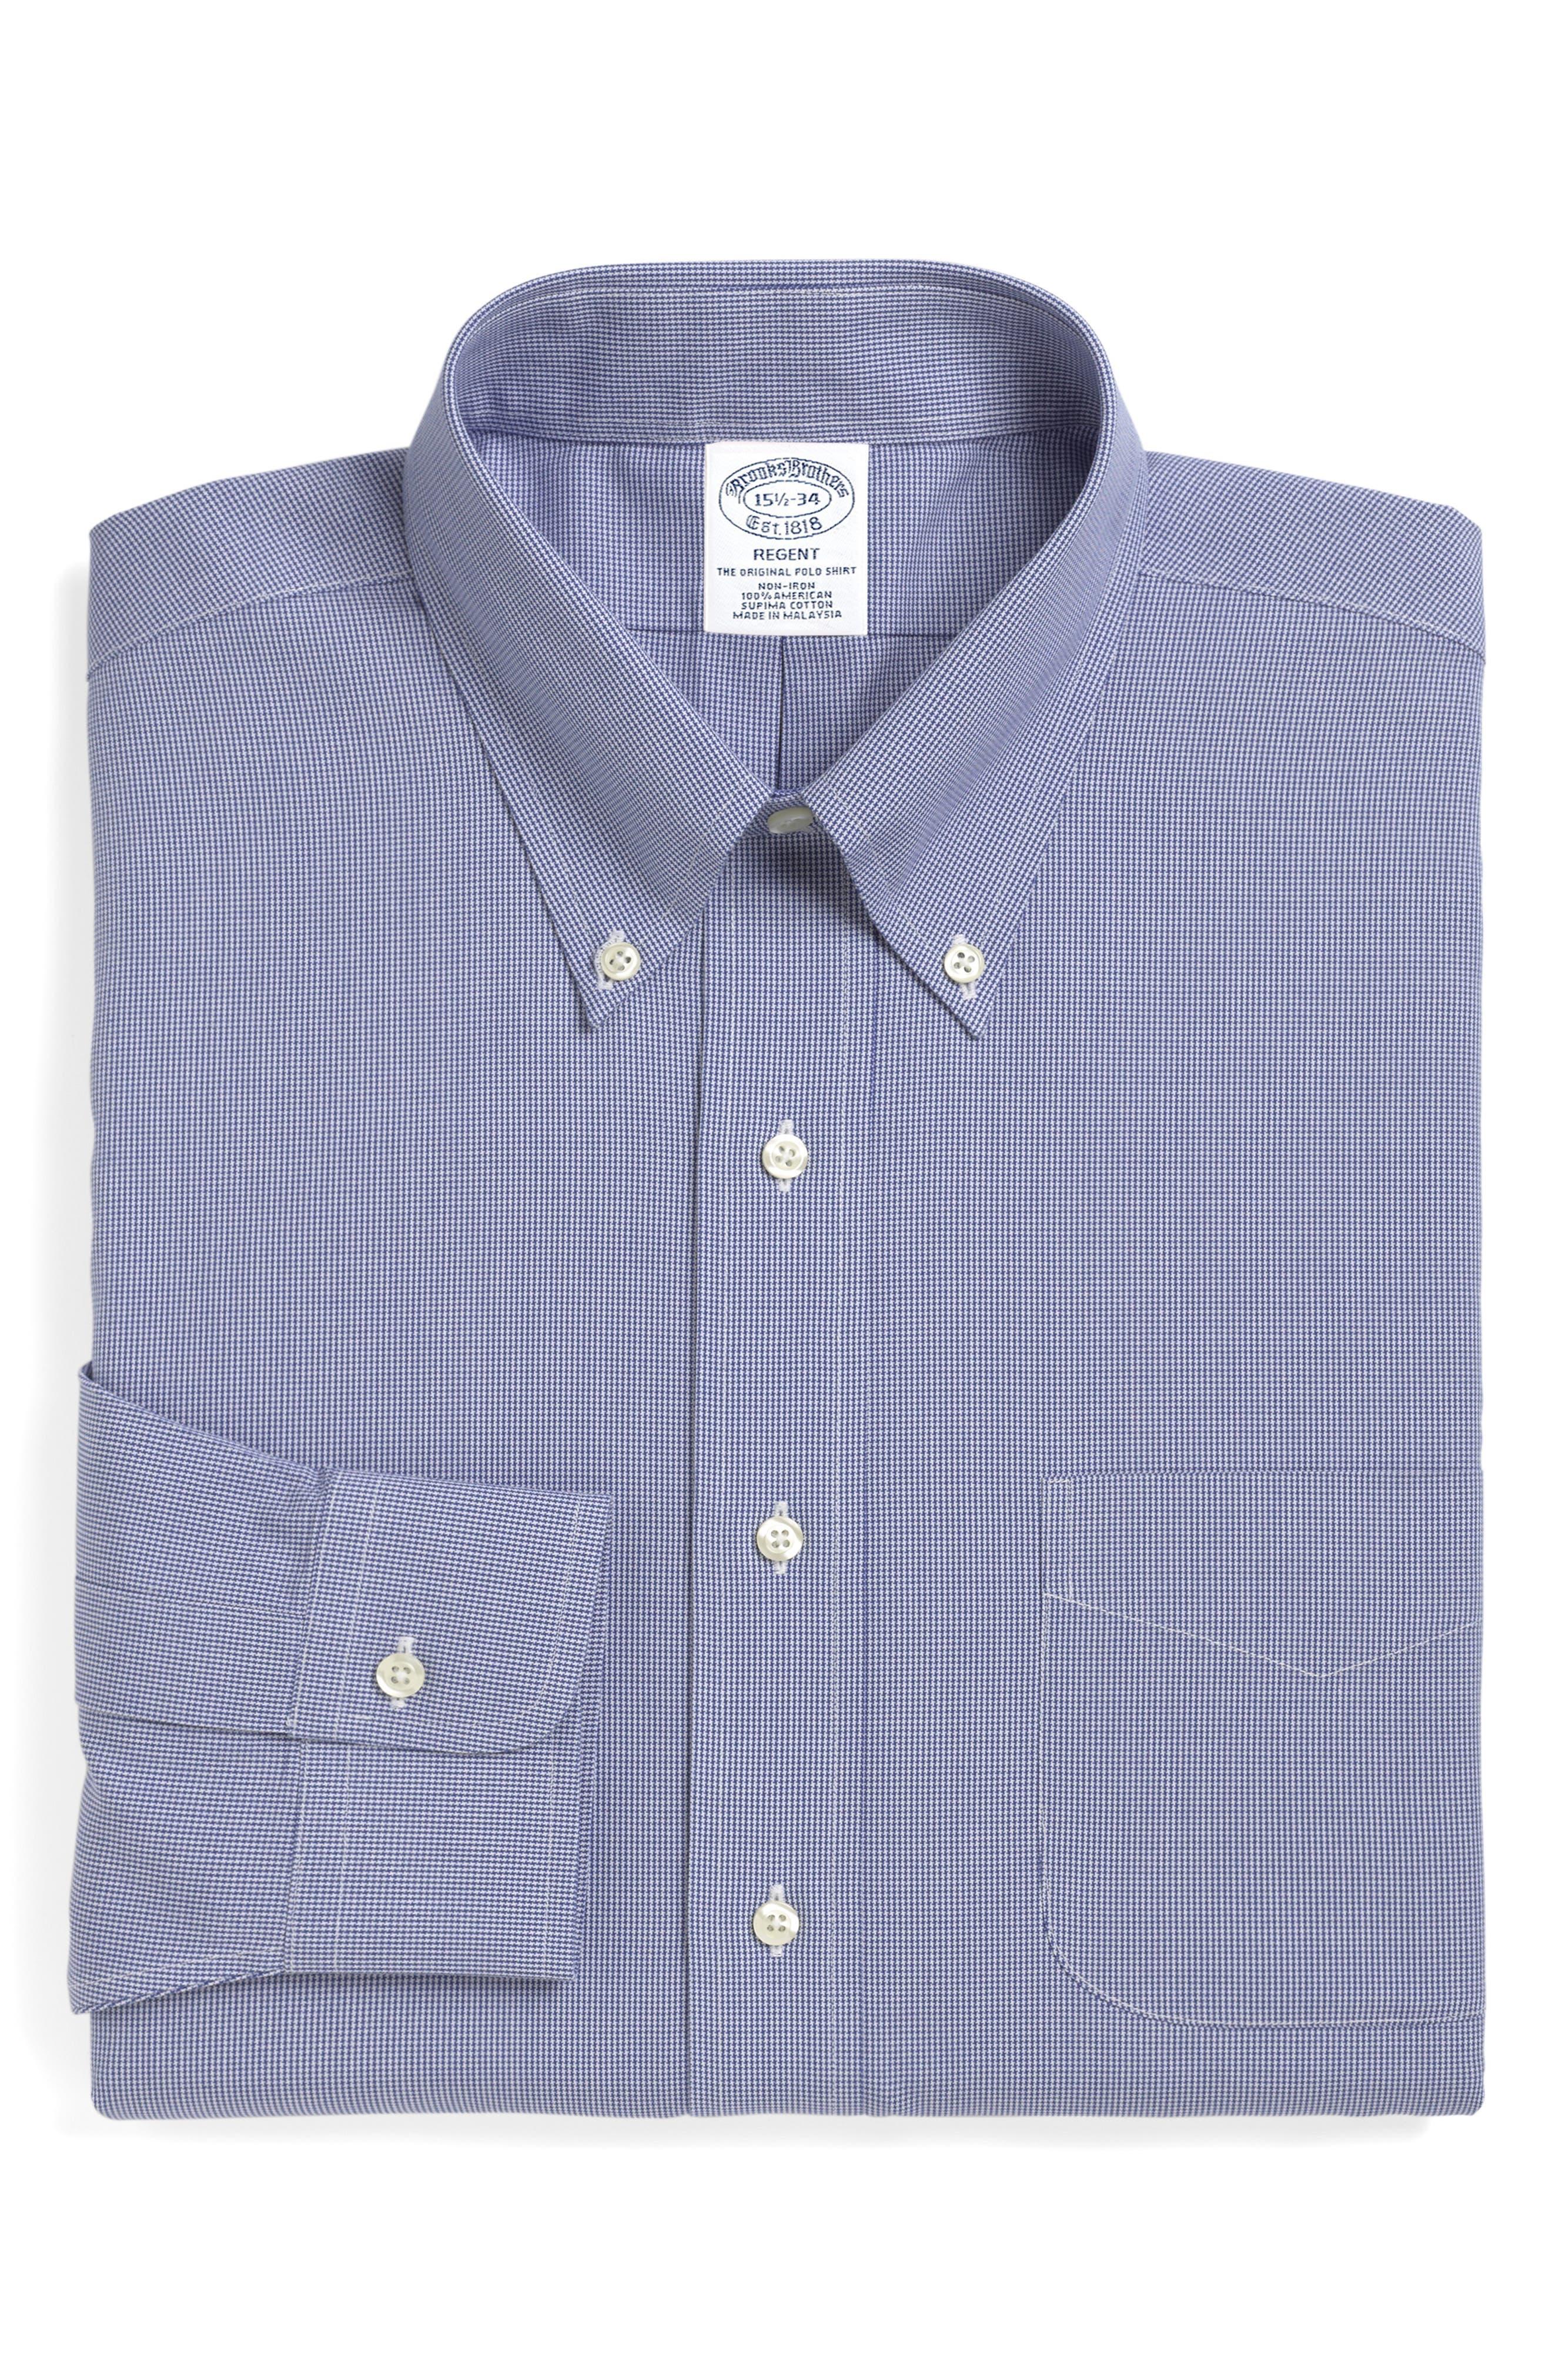 Regular Fit Houndstooth Dress Shirt,                             Main thumbnail 1, color,                             BLUE